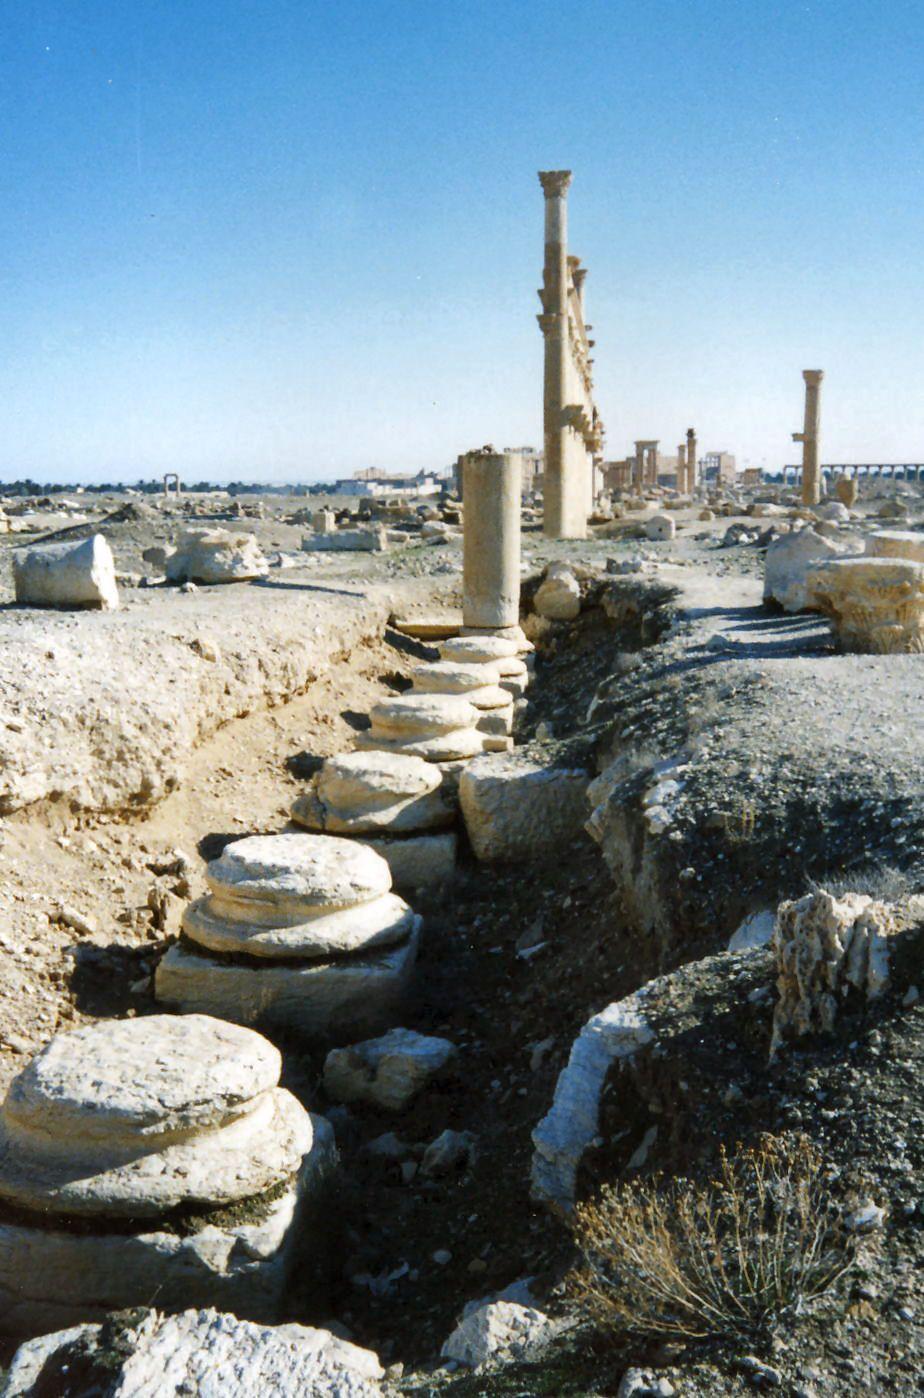 http://www.migladin.com/migtravel/Palmyra_1994_0406